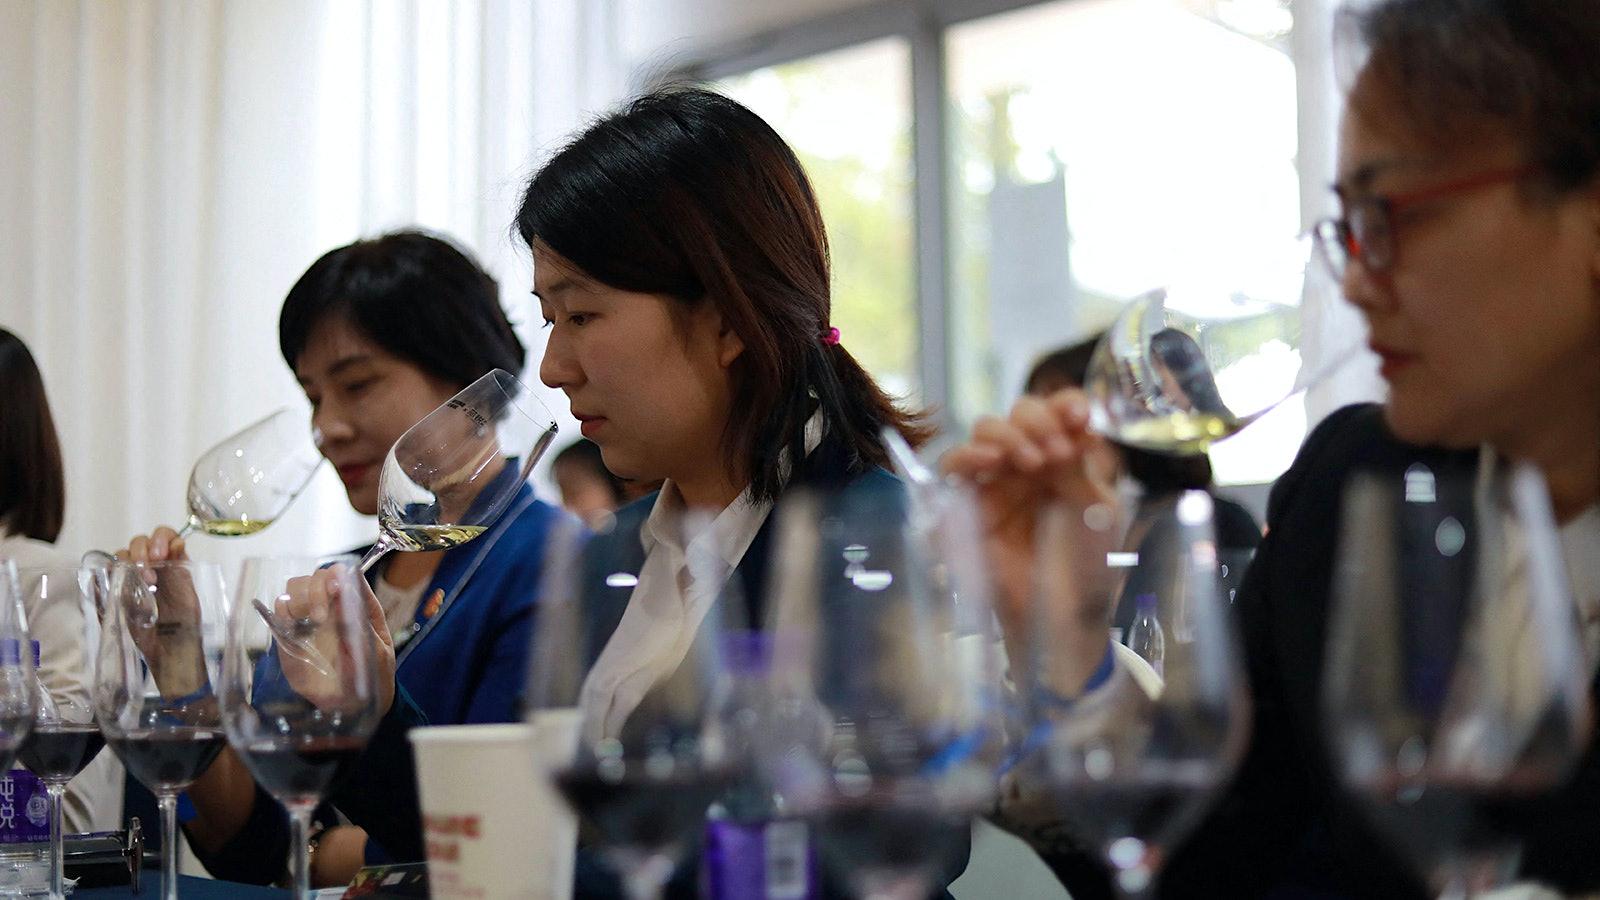 Students of wine]